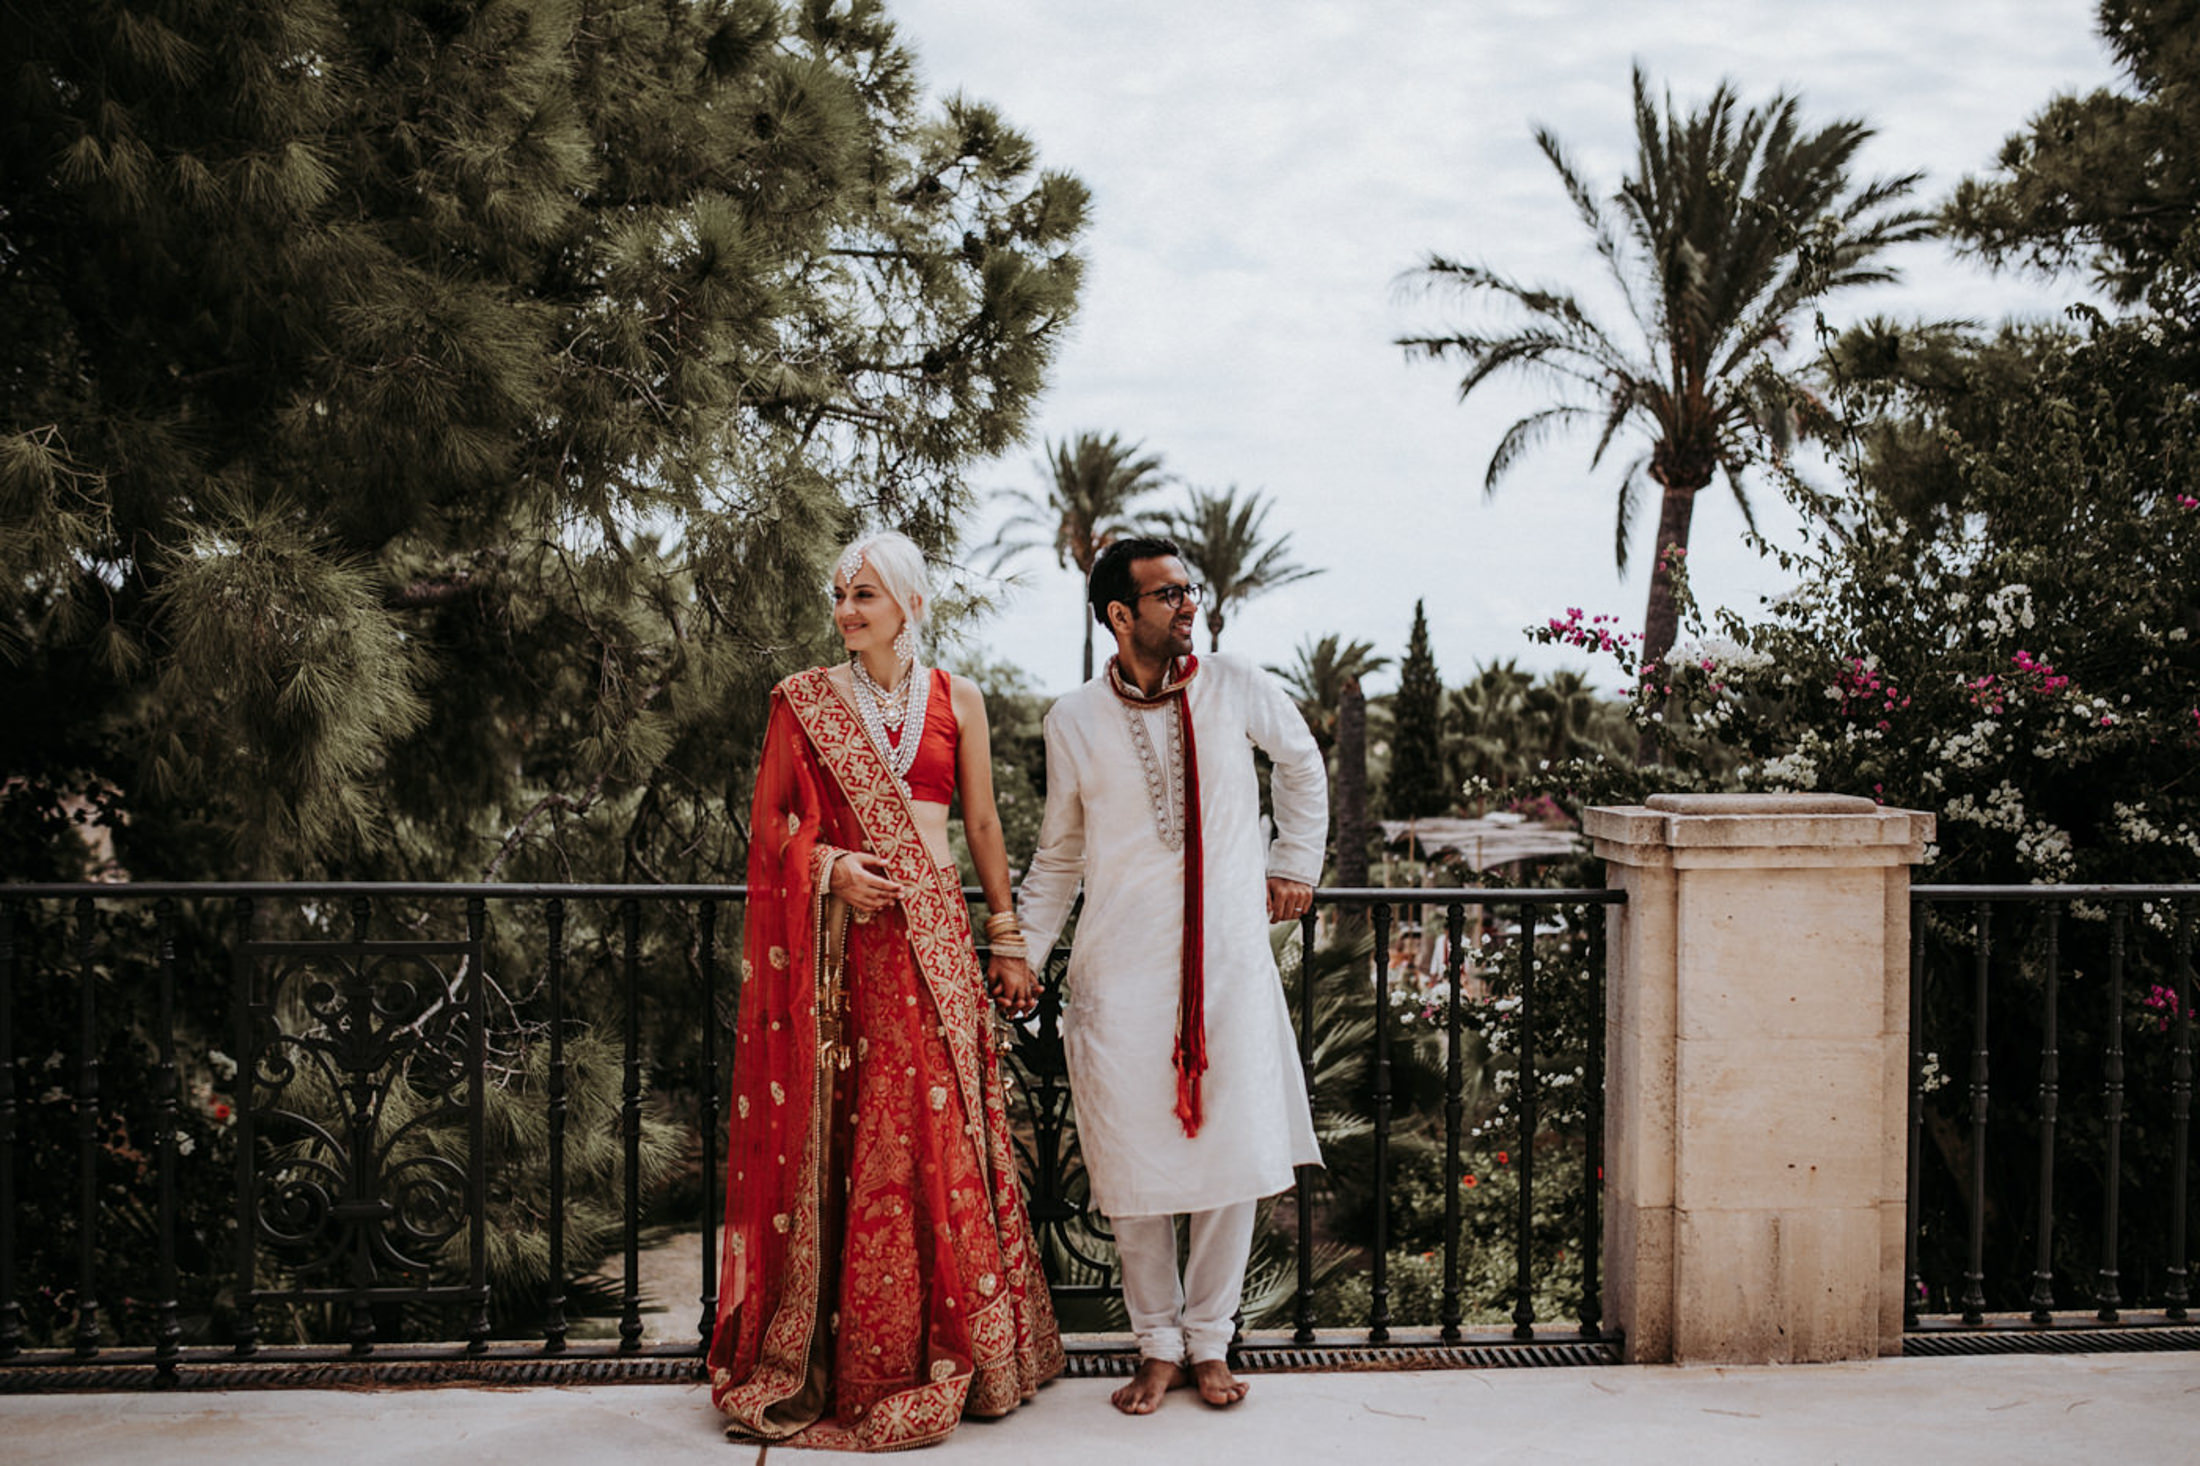 Wedding_Photographer_Mallorca_Daniela-Marquardt_Photography_New_York_Iceland_Tuscany_Santorini_Portugal_Austria_Bavaria_Elopement_Hochzeitsfotograf_AntjeRajat2_66